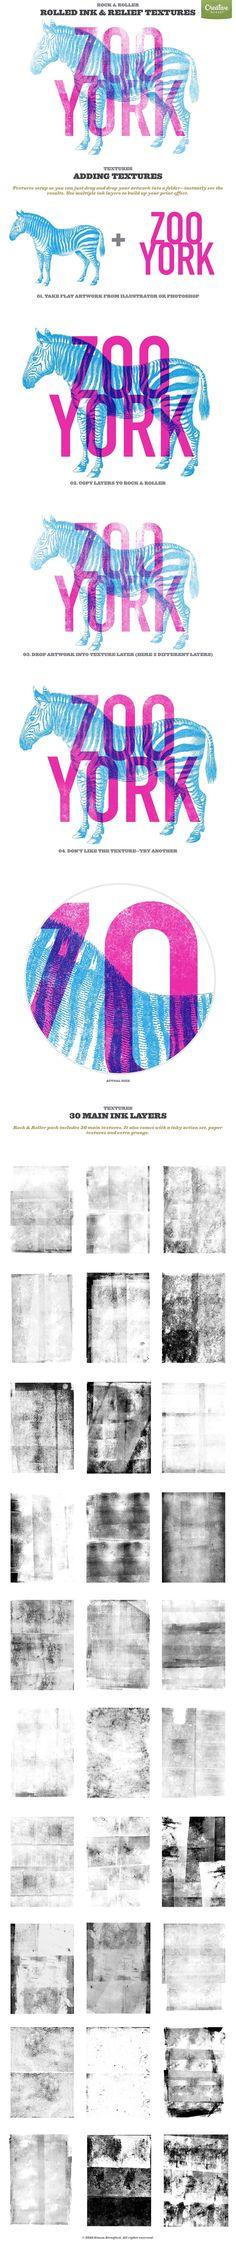 Rock & Roller Letterpress Ink Kit by It's me simon on @creativemarket